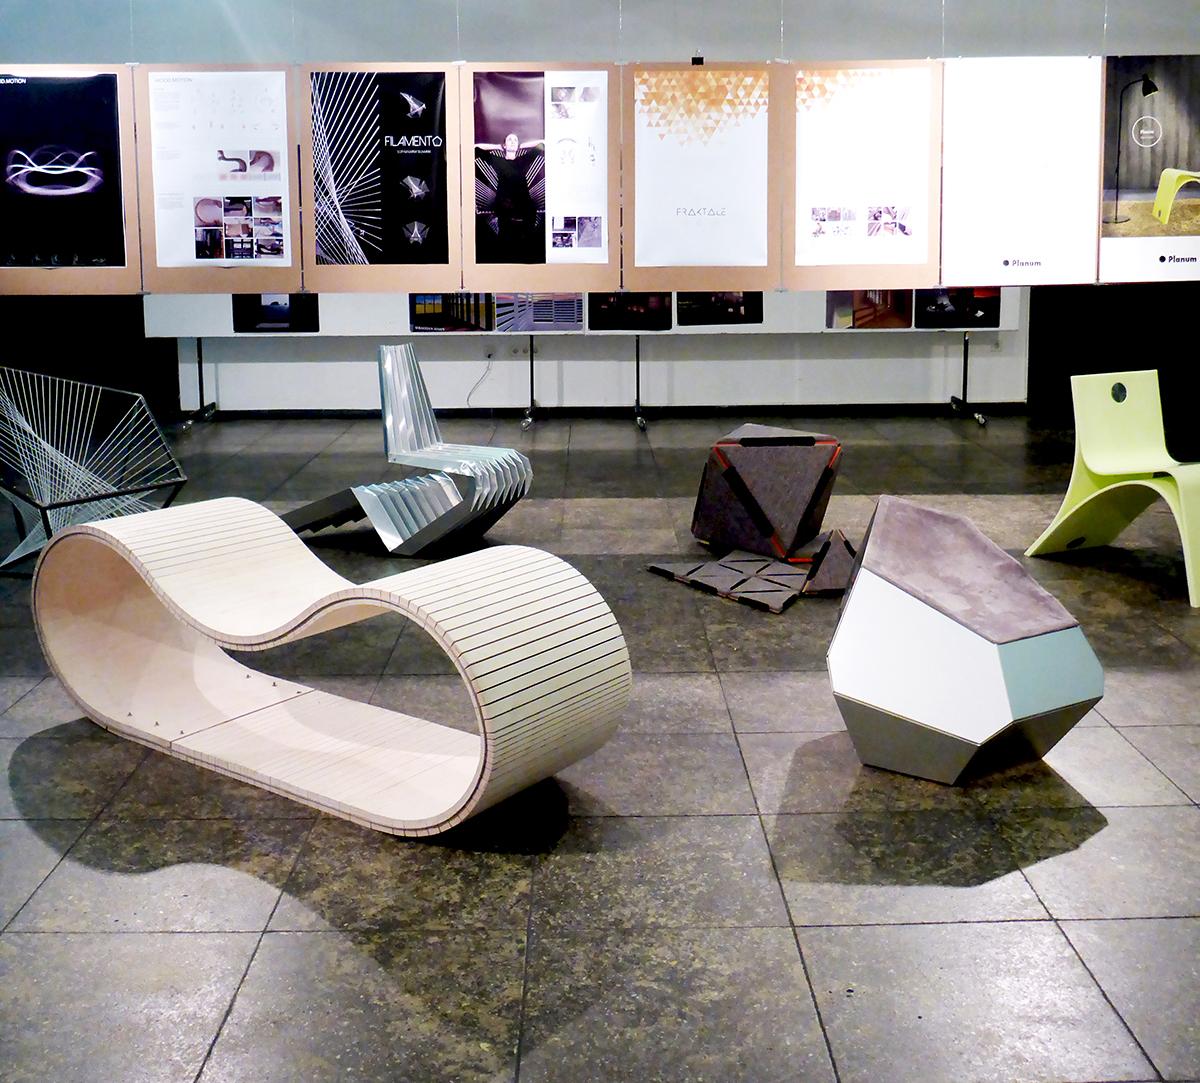 Design Studio Köln workshops | responsive design studio